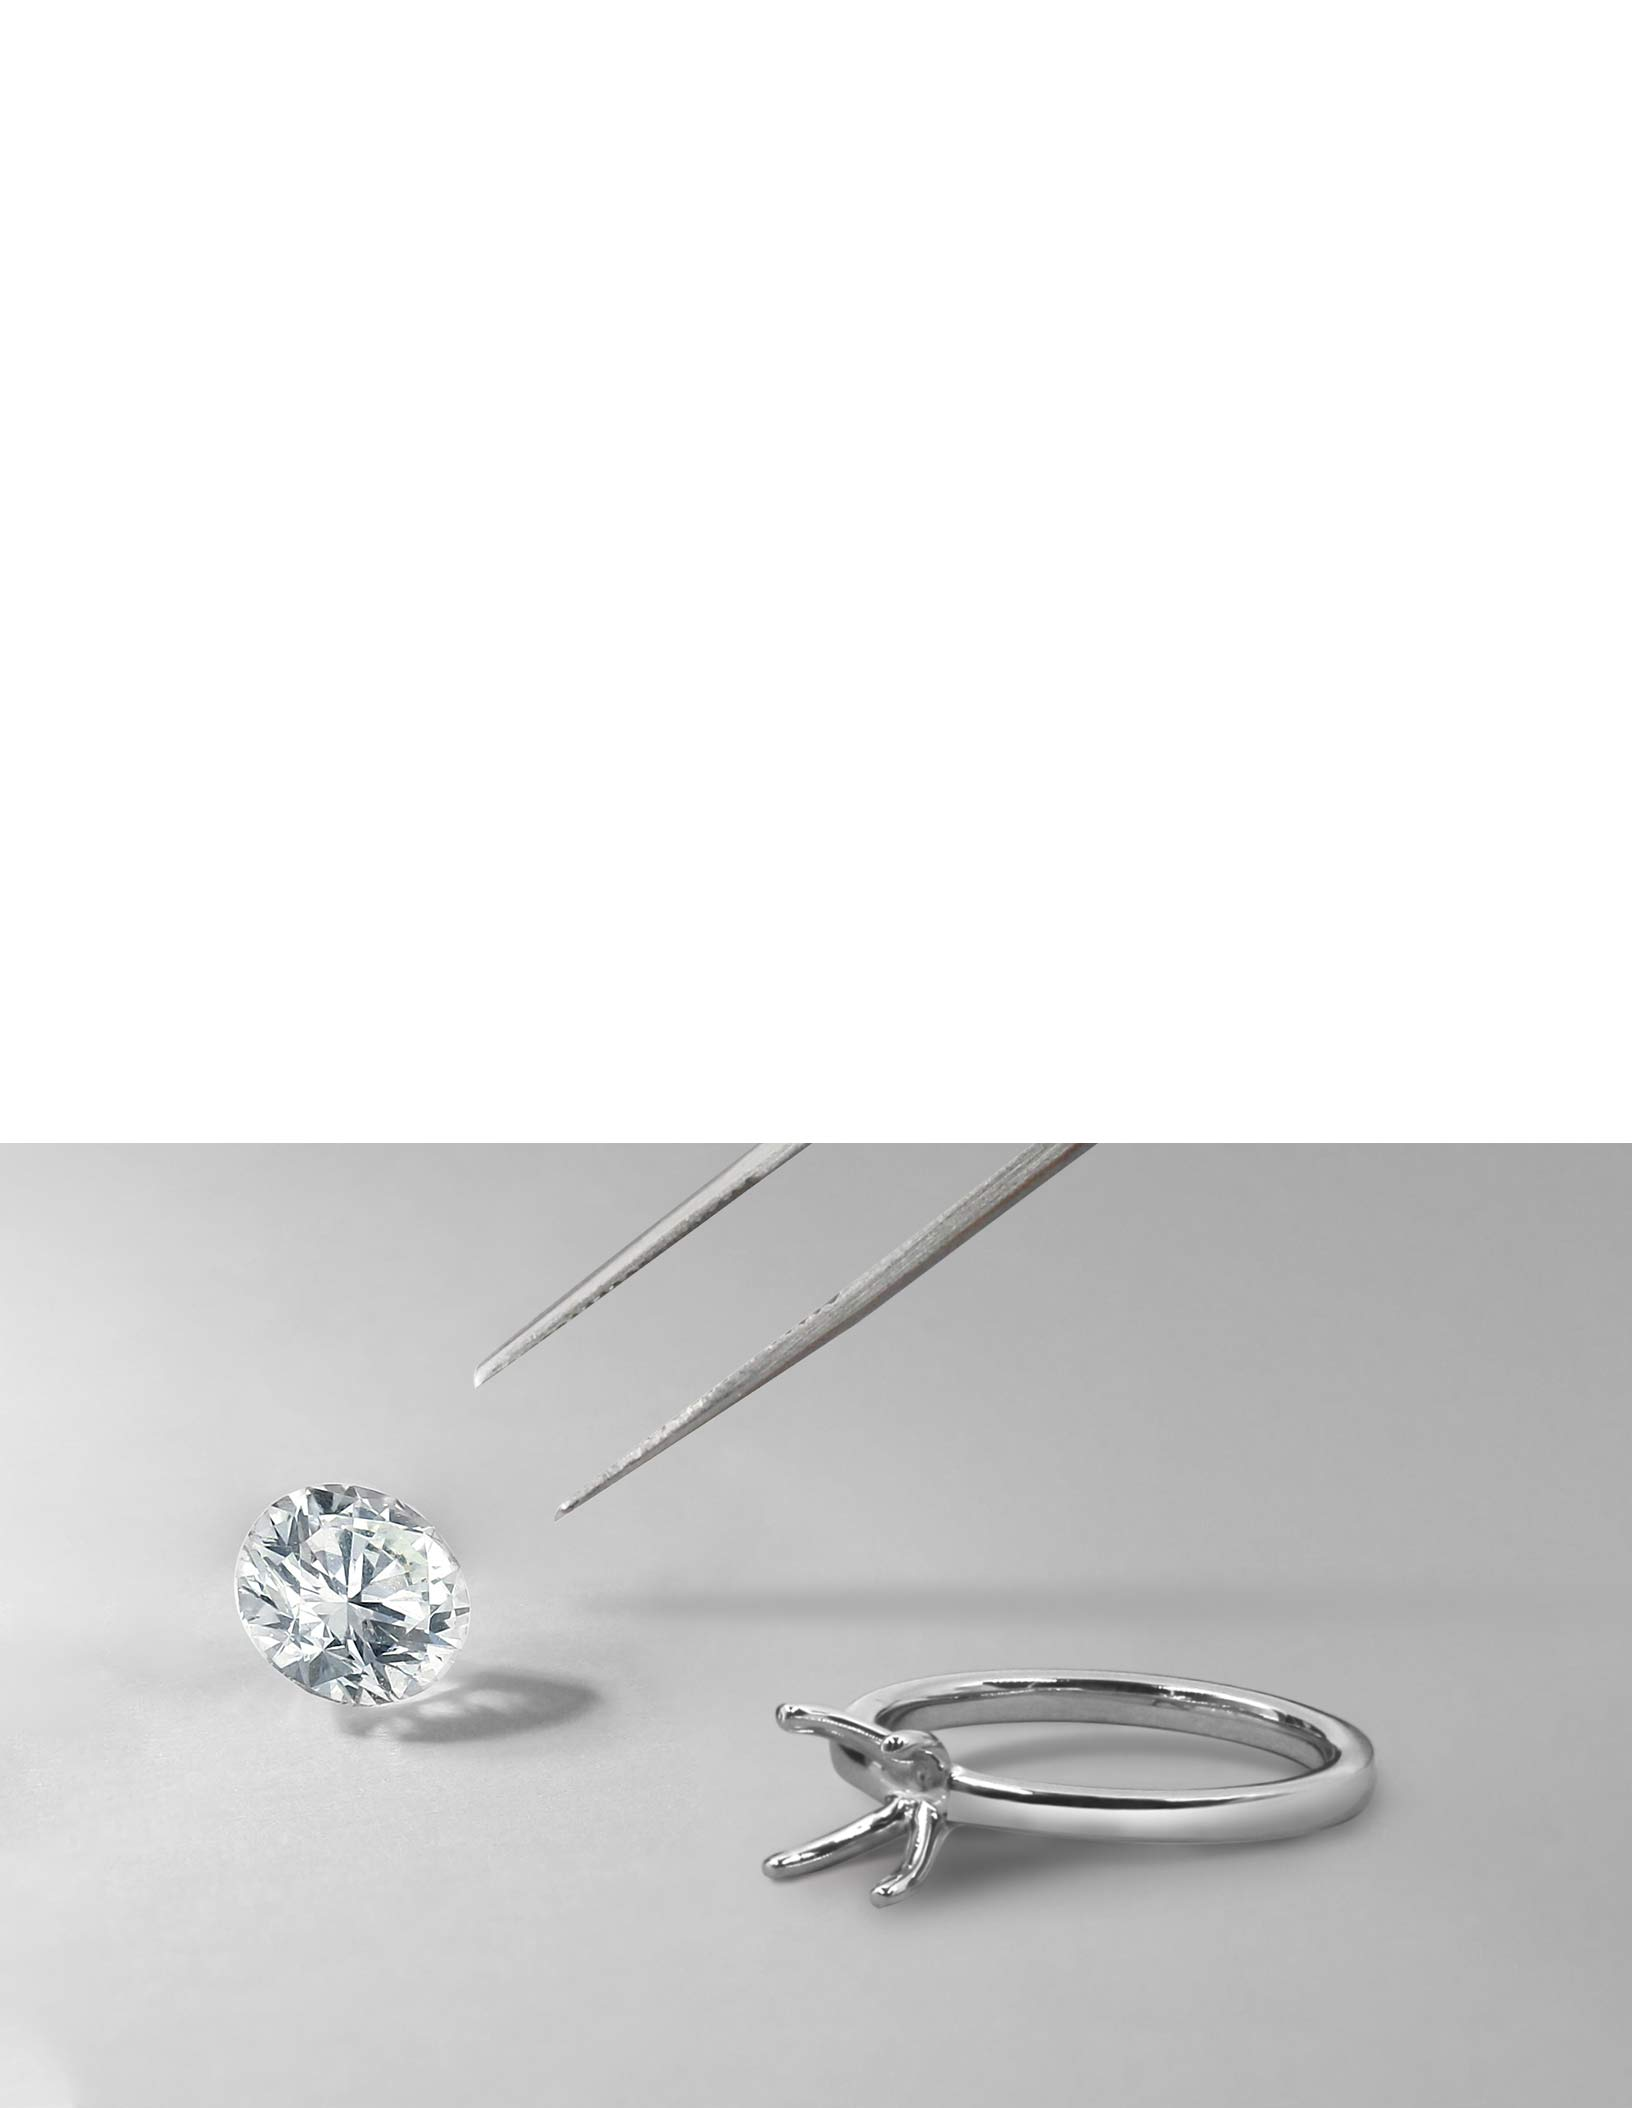 Cushion Cut Shoulder Set Engagement Rings